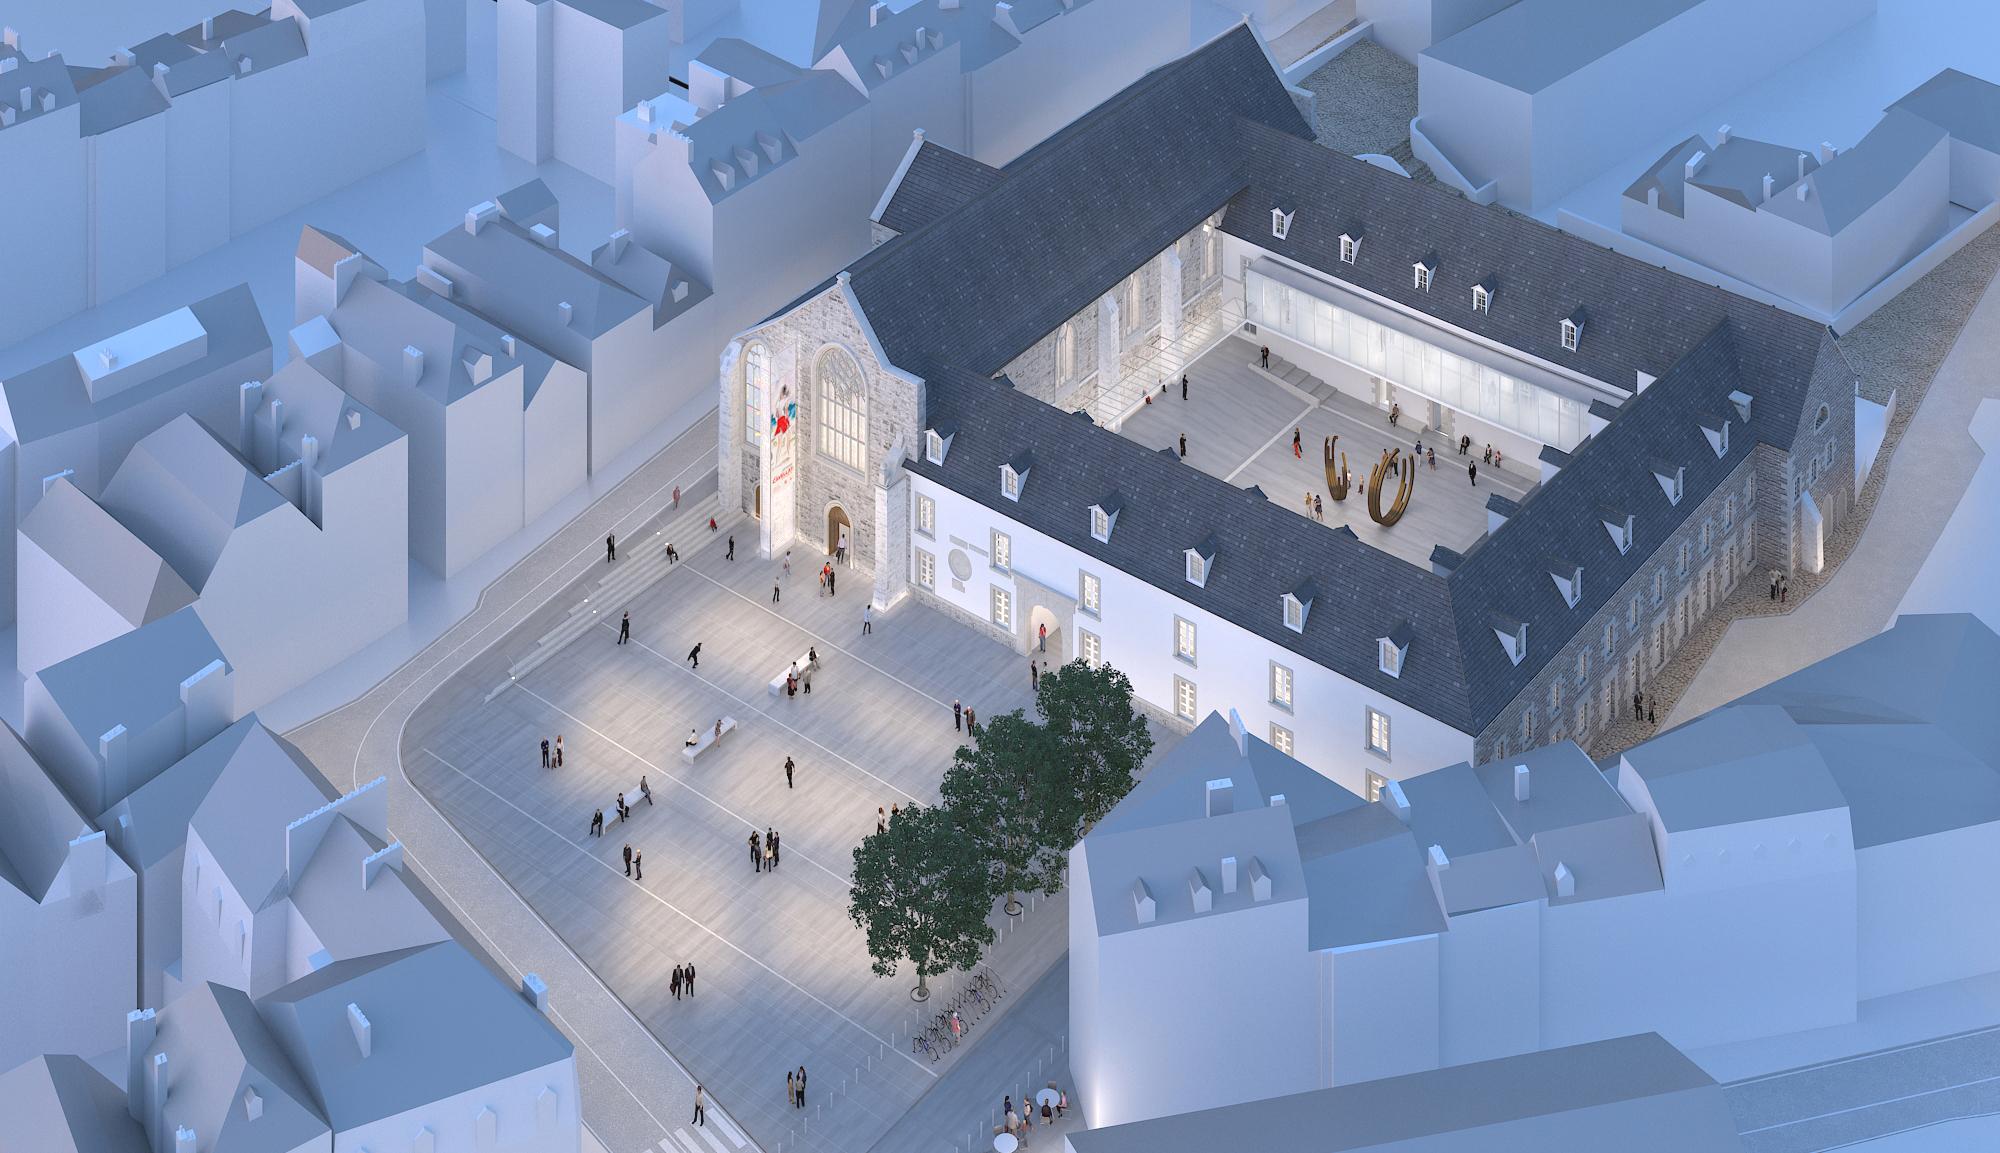 musée_jacobins_morlaix_public_outdoor_design_christophe_gautrand_paysagiste_5.jpg